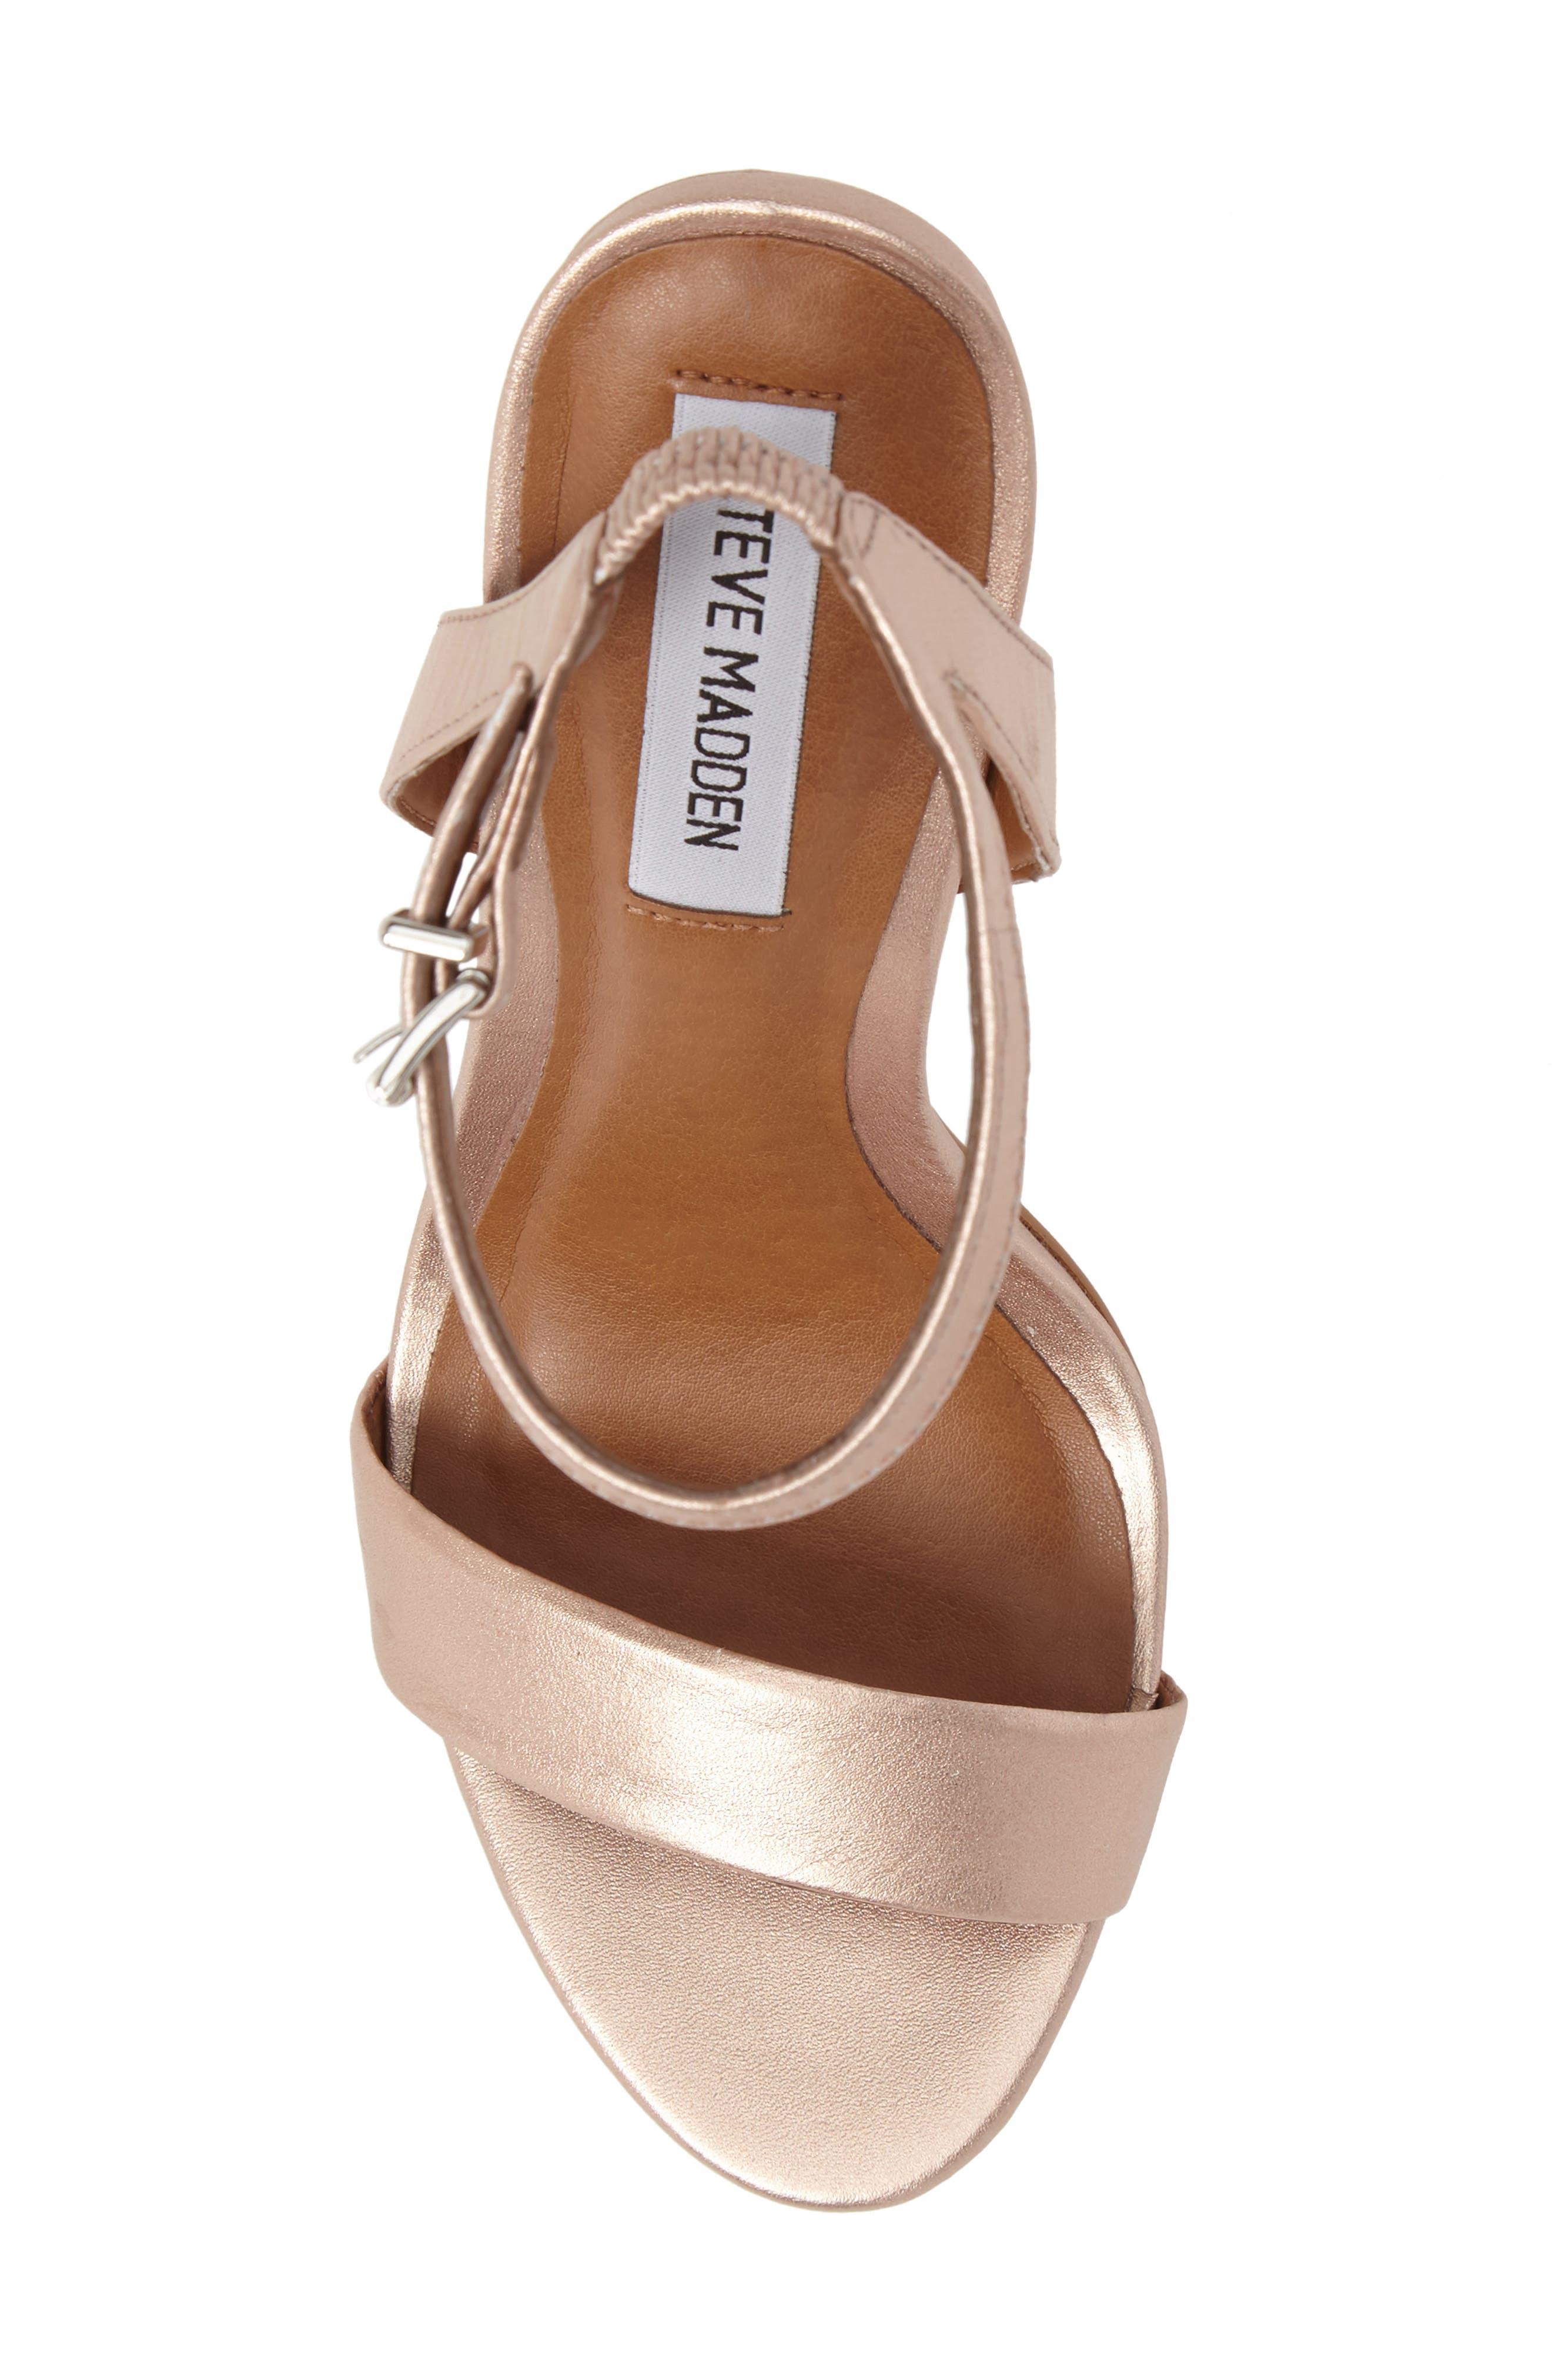 Landen Ankle Strap Sandal,                             Alternate thumbnail 83, color,